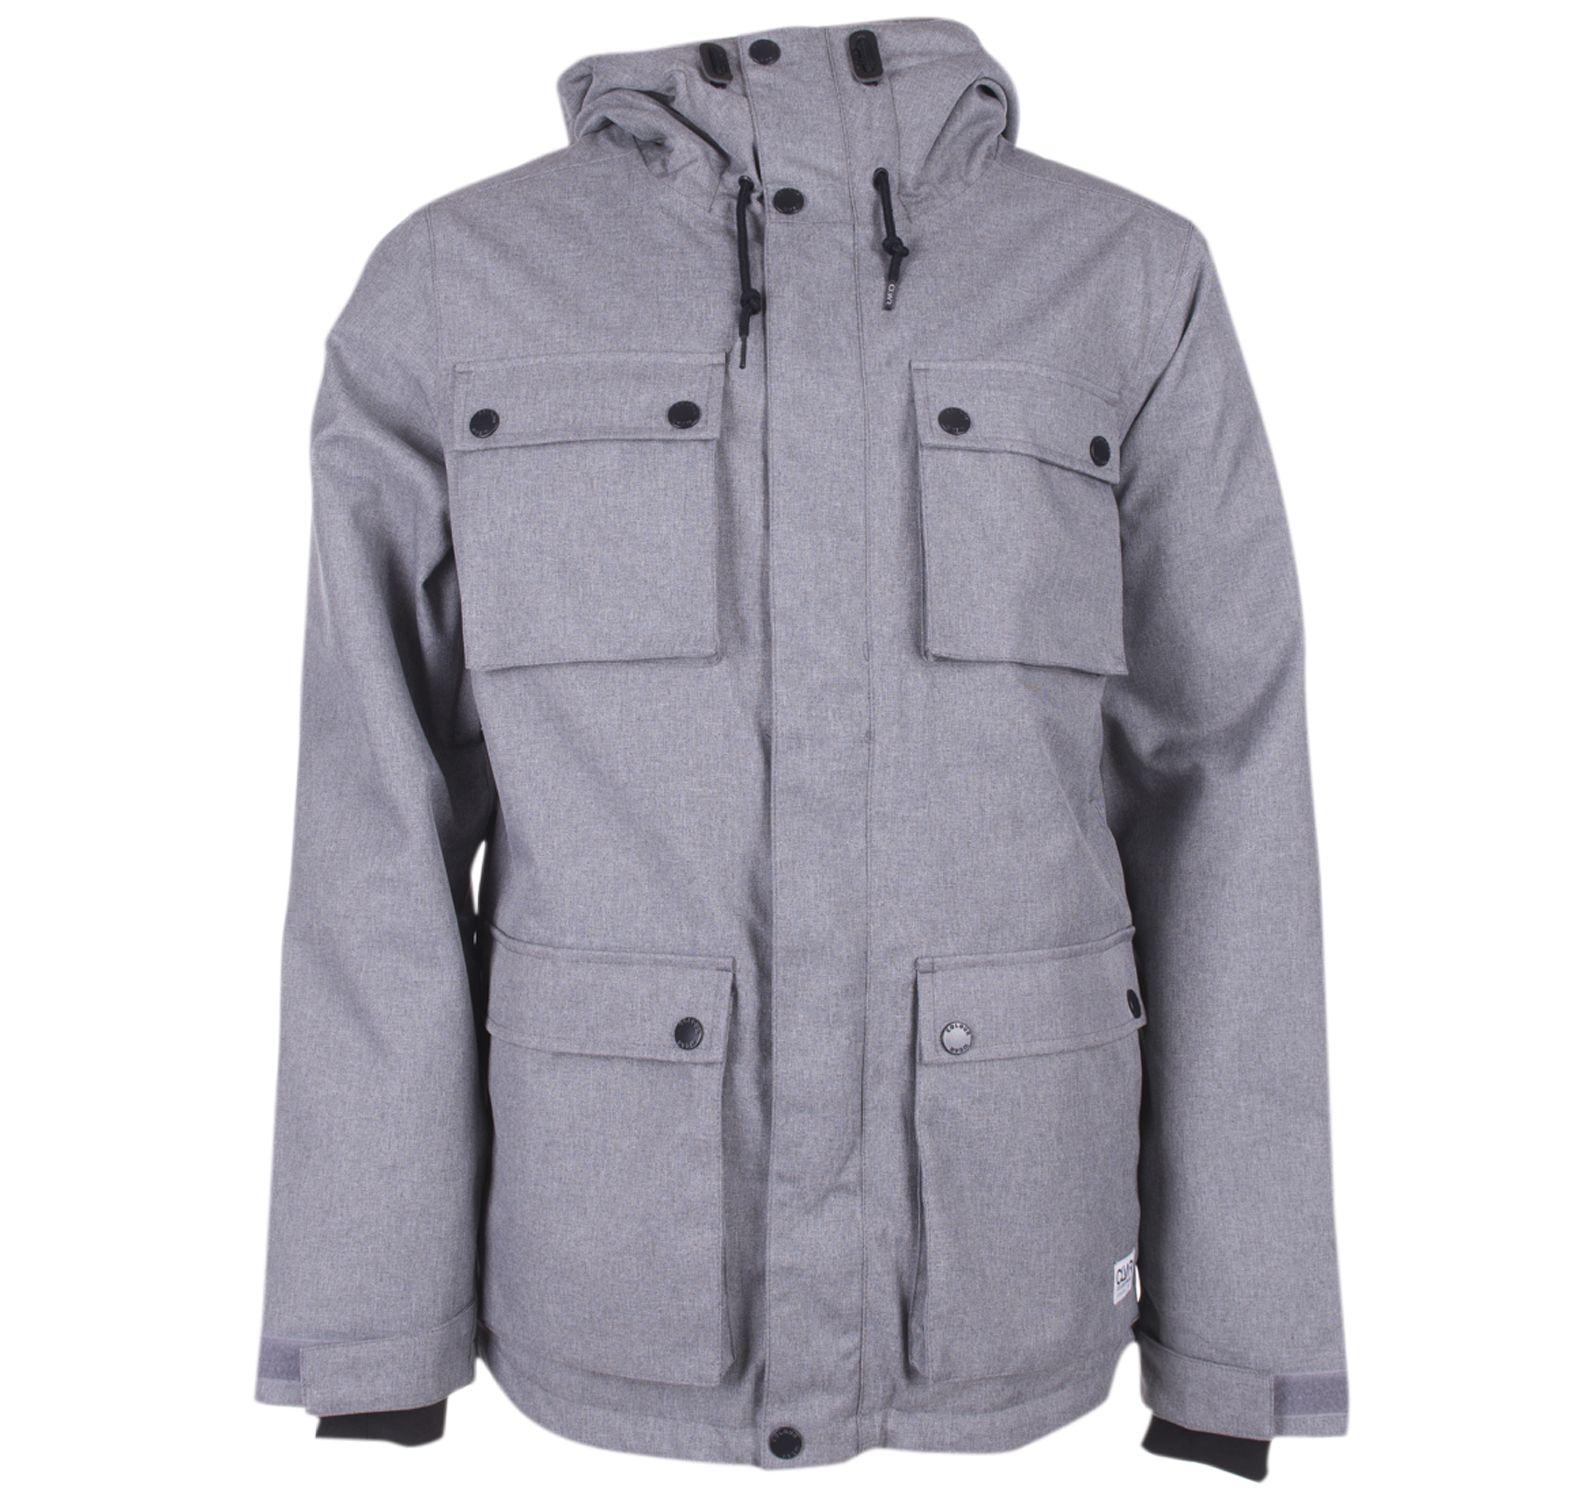 clwr cargo jacket, grey melange, l,  wearcolour